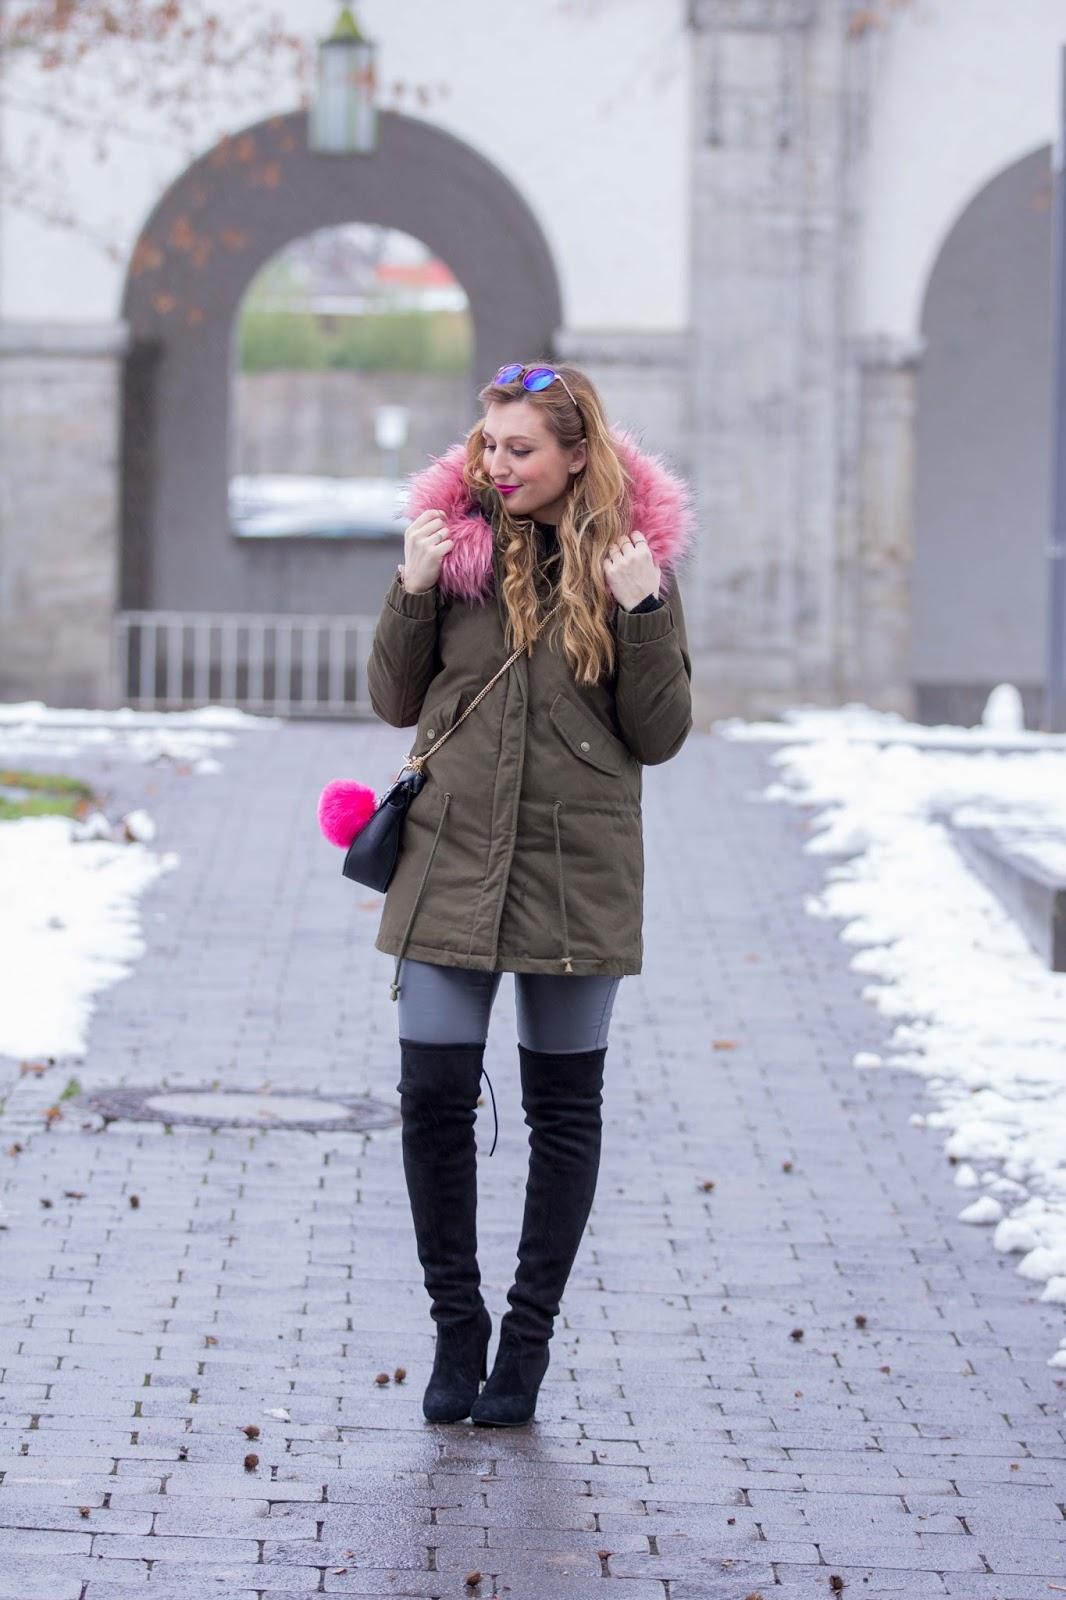 Fashionblogger-Parka-Parka-mit-buntem-Fell-pinkes-Fell-Khaki-Parka-BloggerstyleFashionblogger-Parka-Parka-mit-buntem-Fell-pinkes-Fell-Khaki-Parka-Bloggerstyle